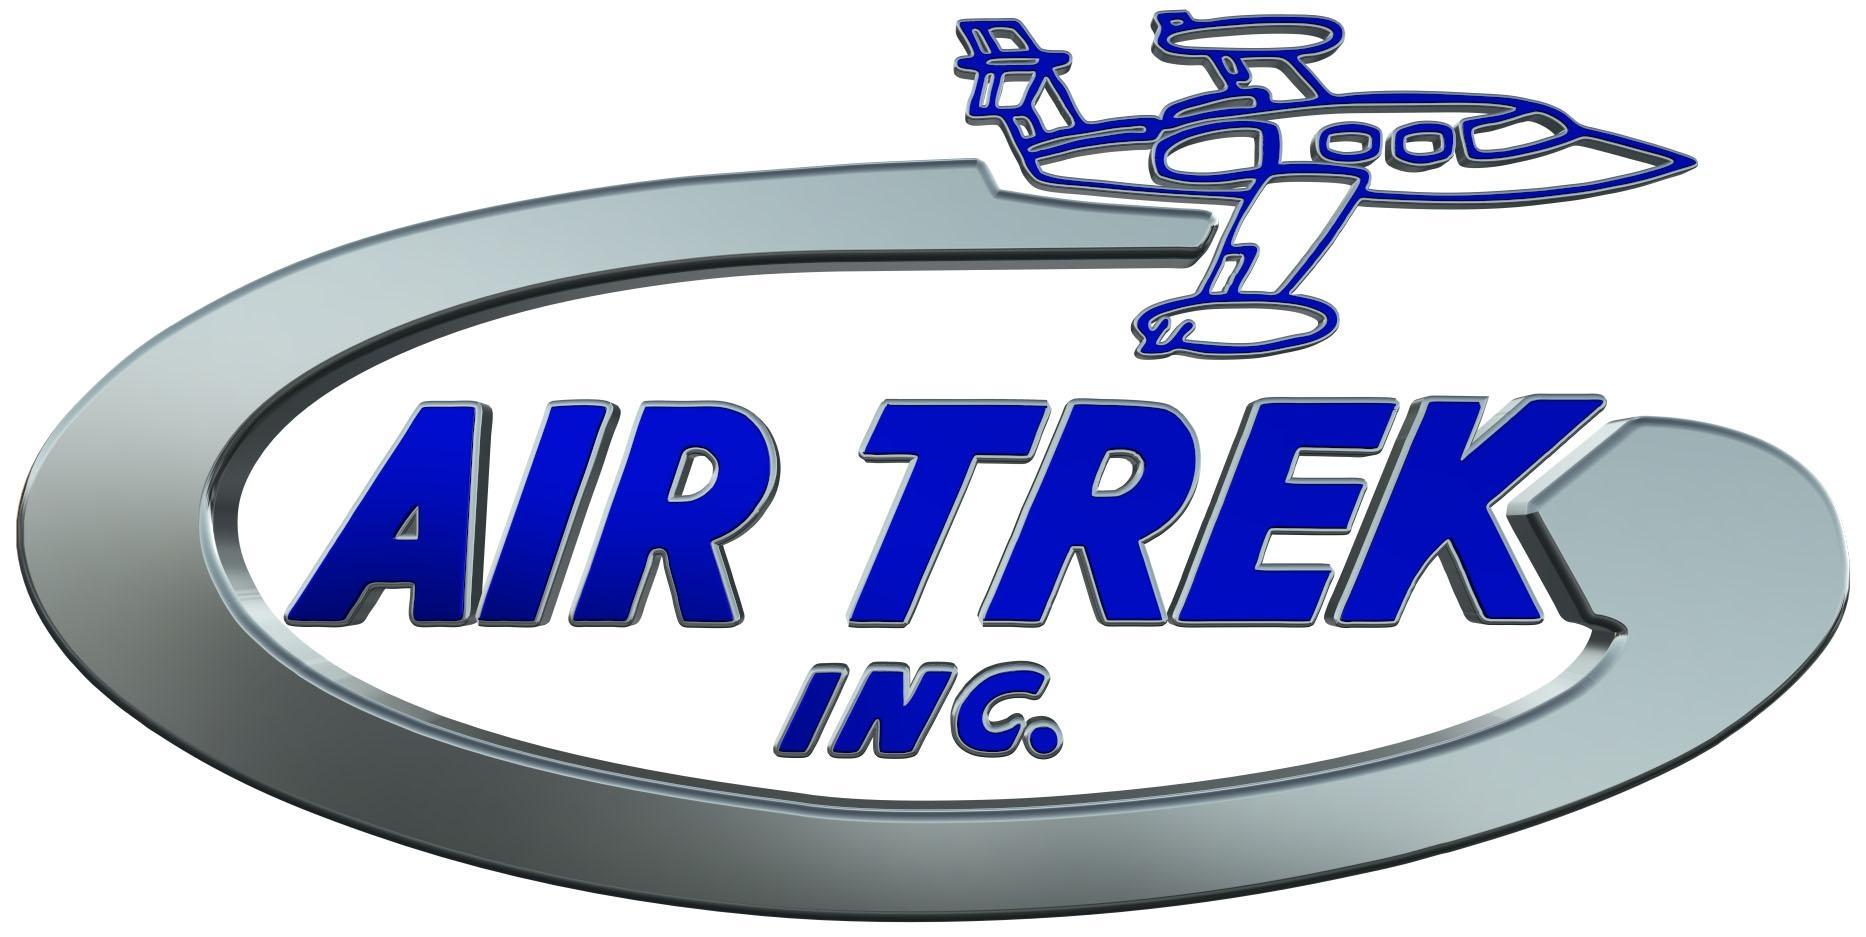 Air Trek inc. Jet Charter Company image 2